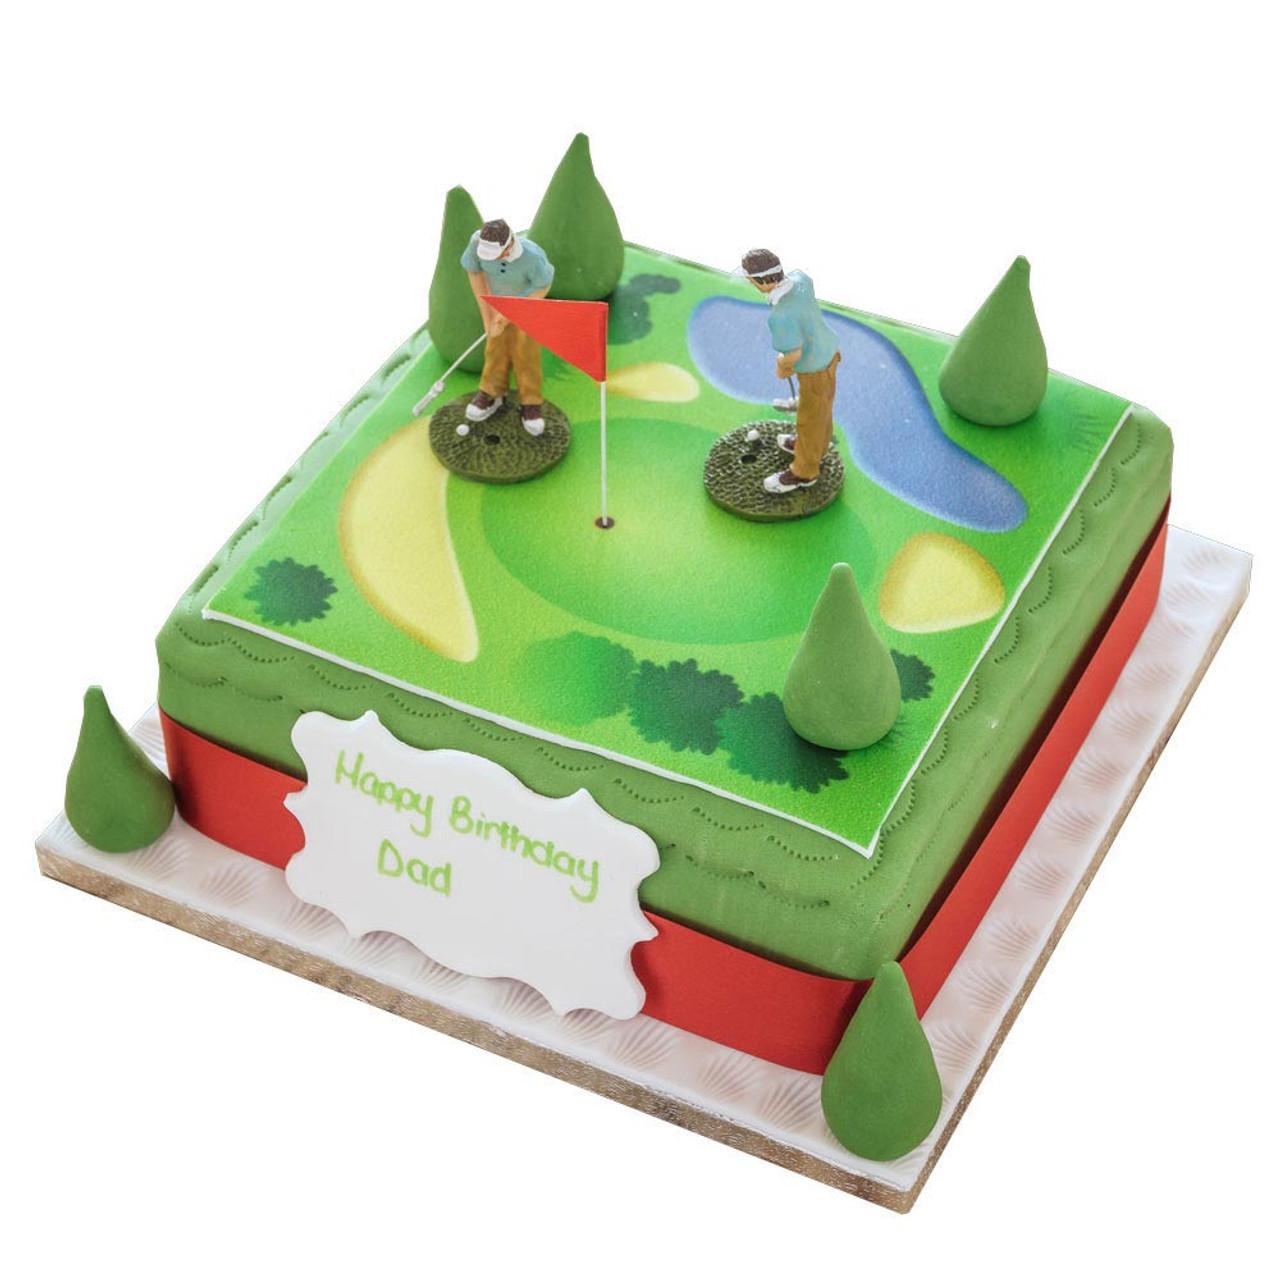 Golf Birthday Cake | Sporting Birthday Cakes | The Brilliant Bakers